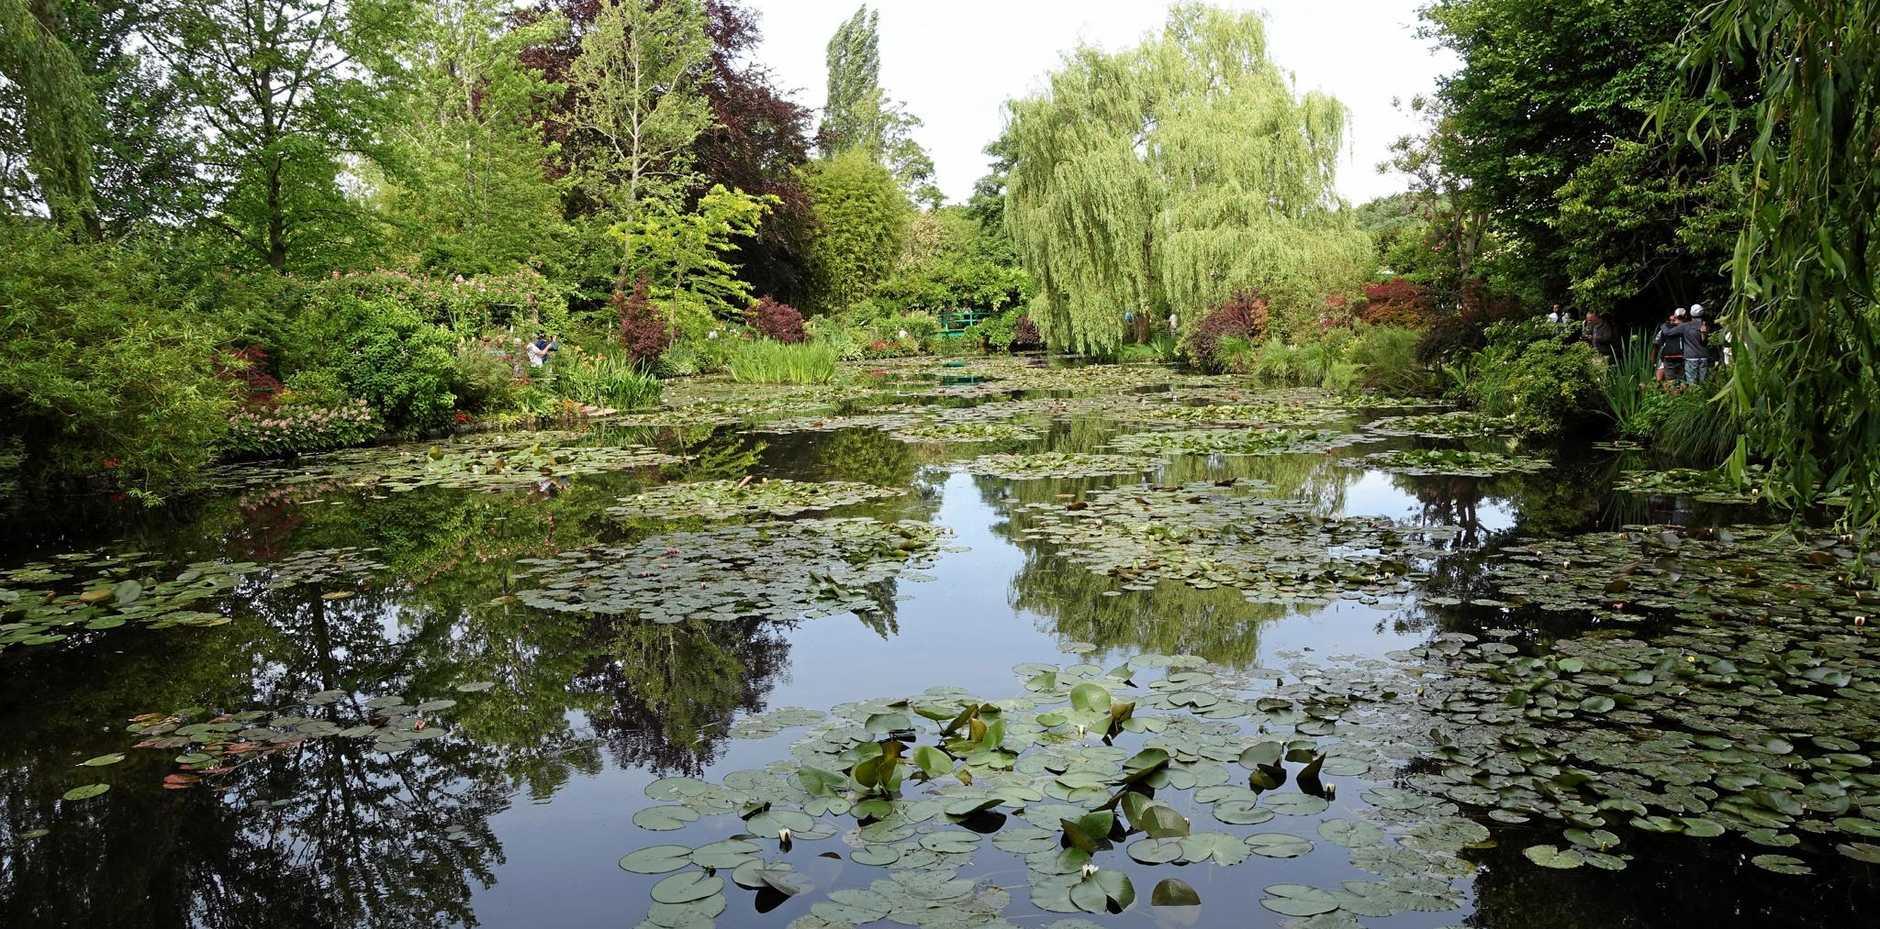 The beauty of Claude Monet's famous lily ponds.